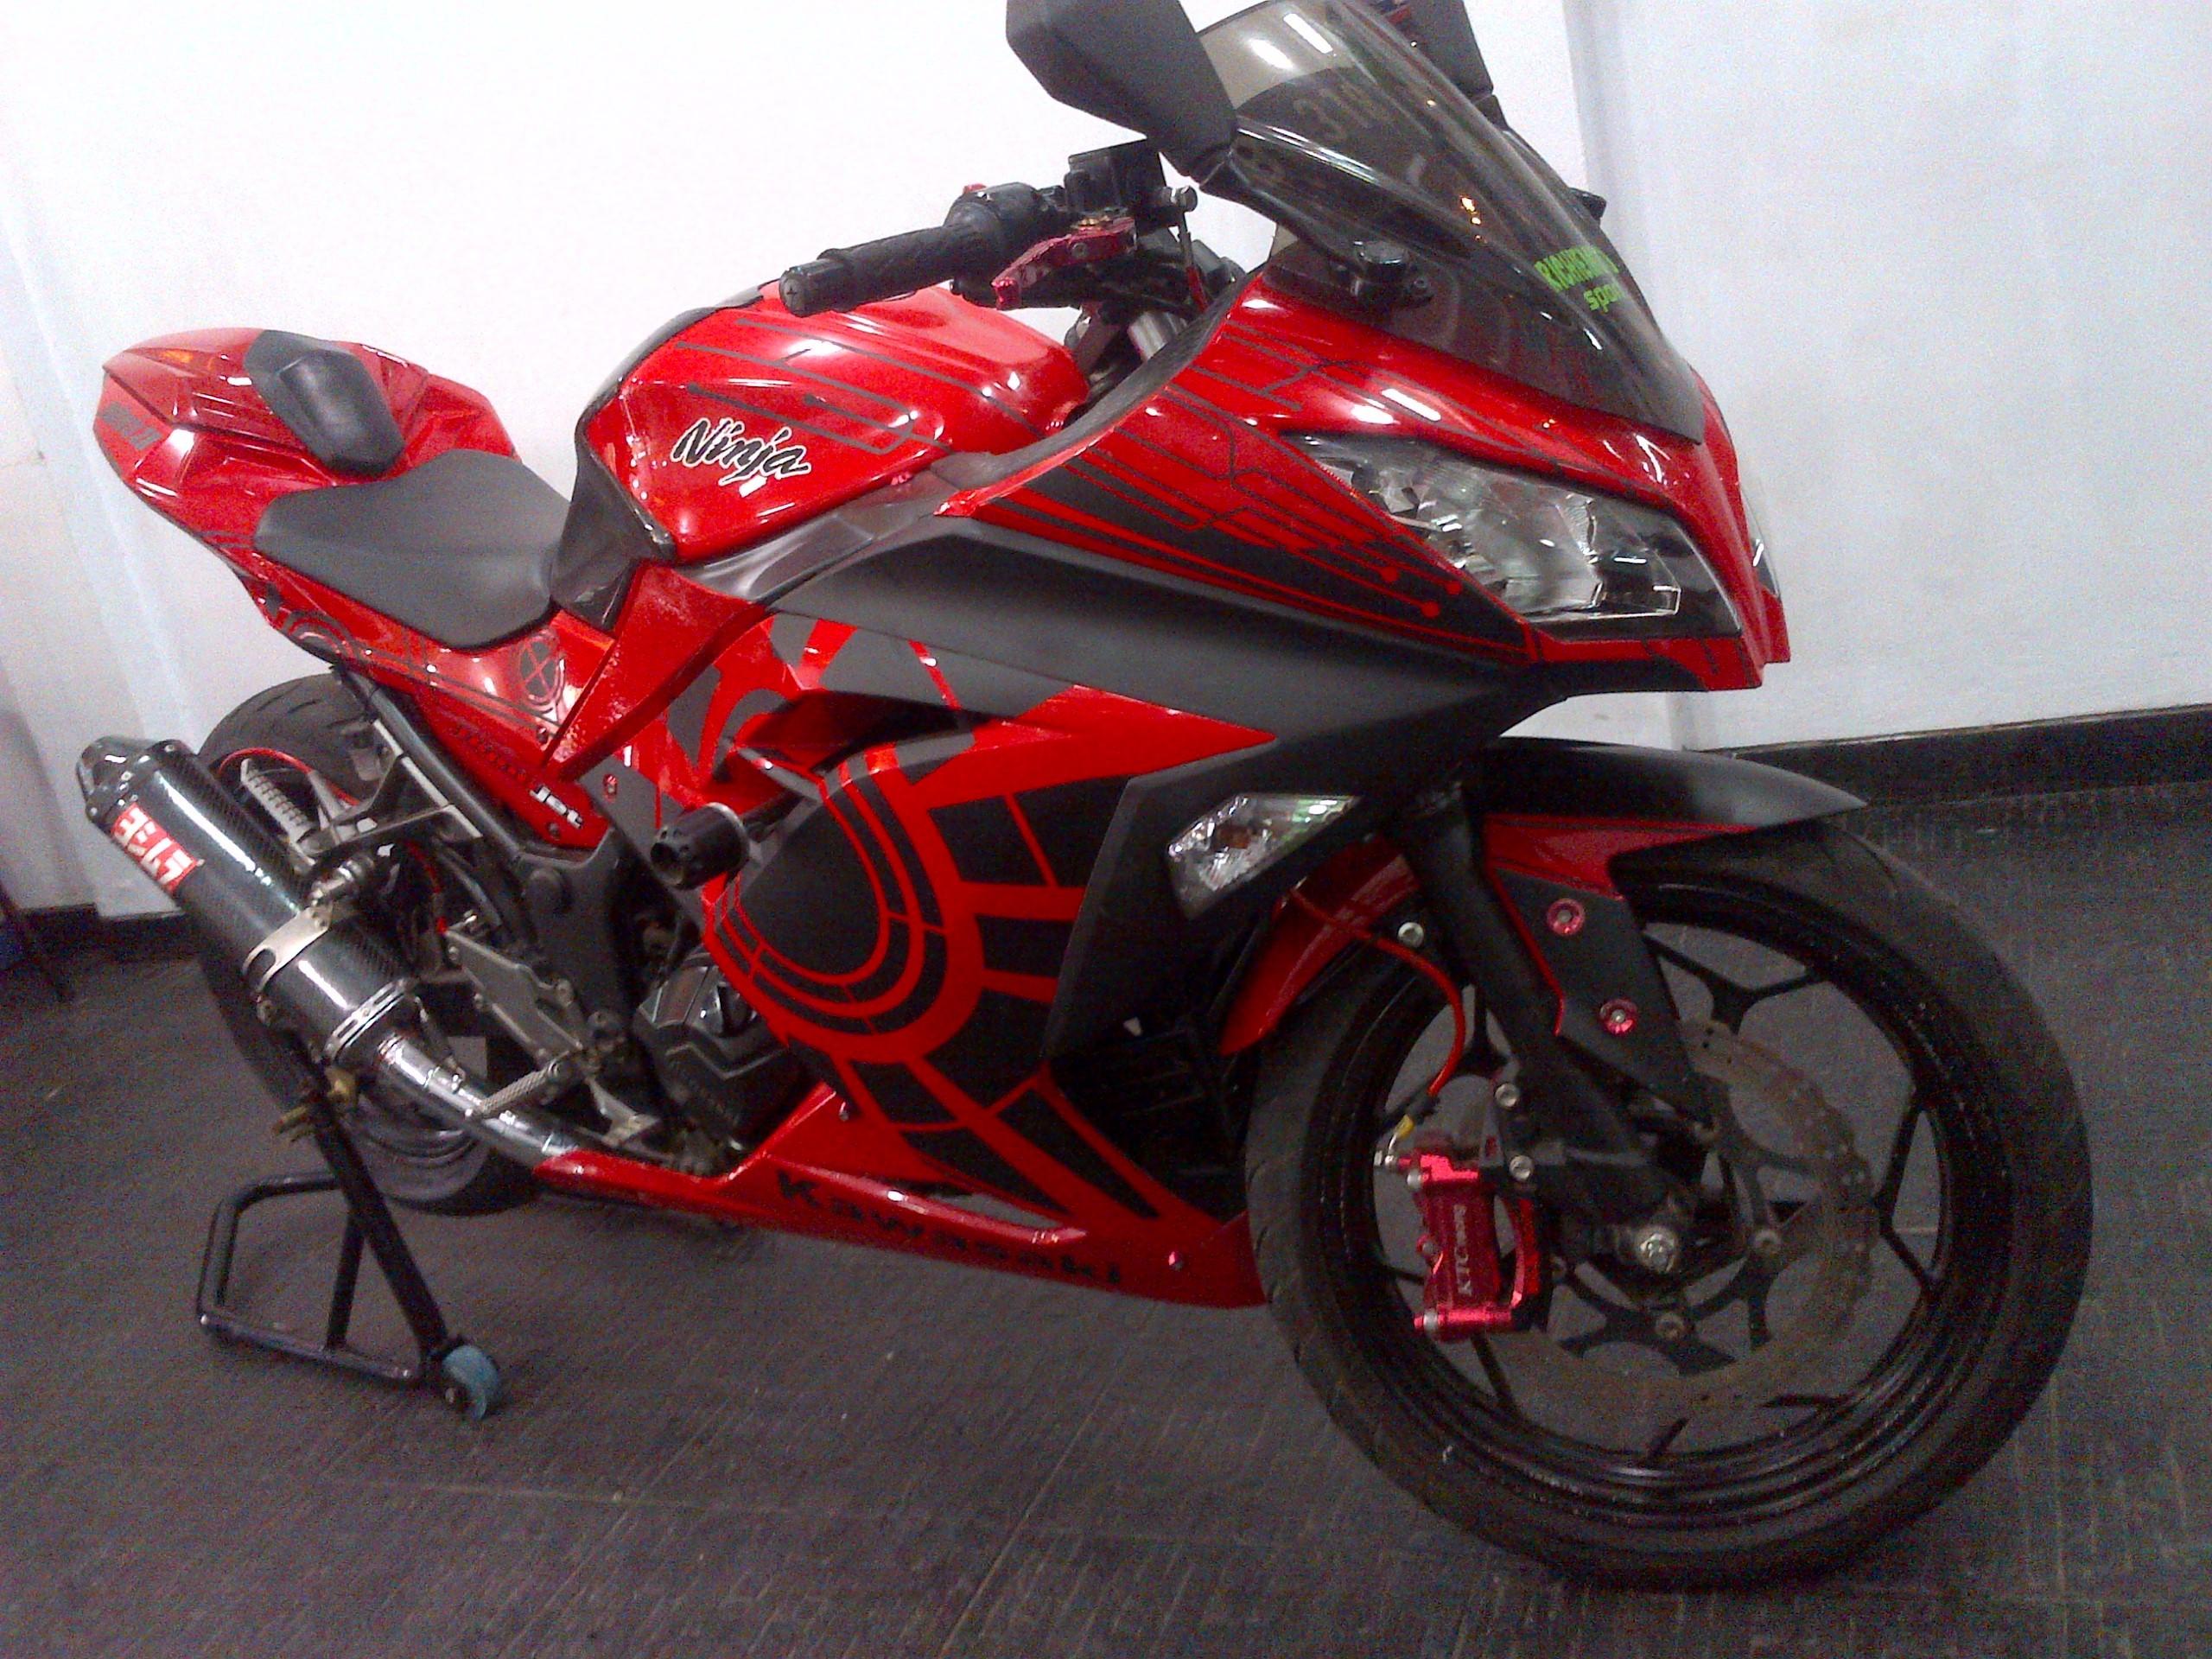 Kumpulan Gambar Modifikasi Motor Ninja 4 Tak Warna Merah